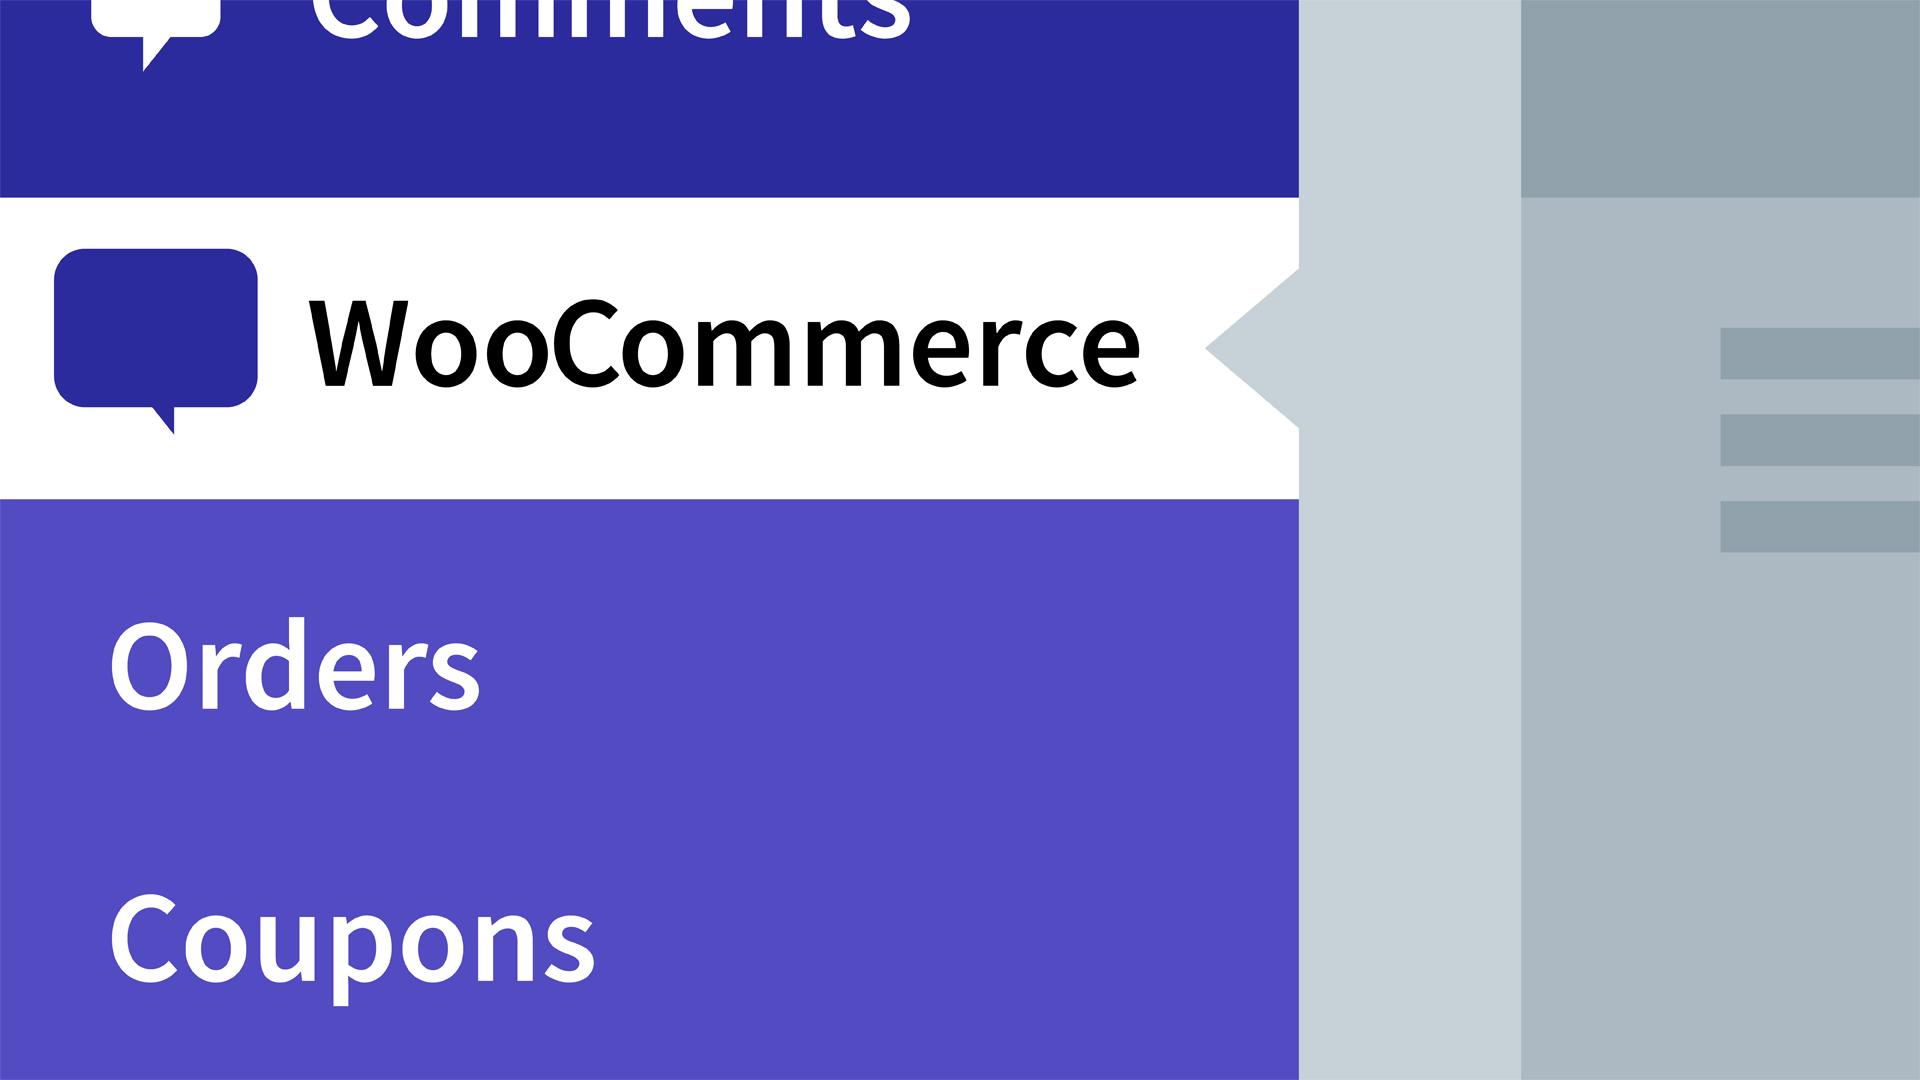 Wordpress Ecommerce Development Company